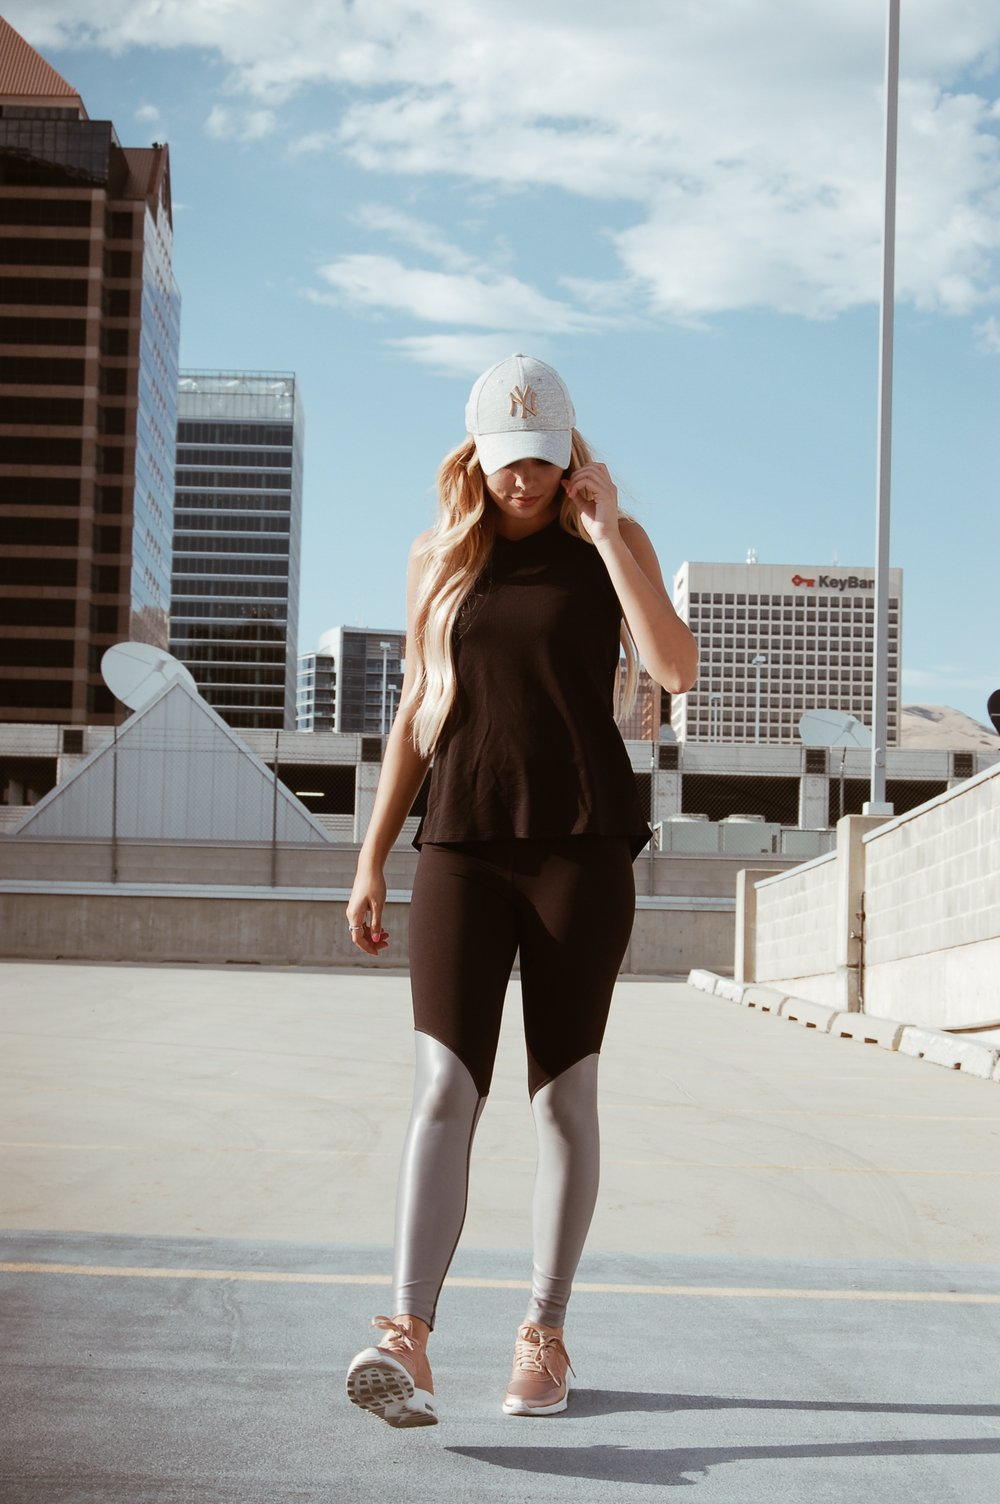 Breathe Tank Black//  Pheel   Special thanks to  Pheel  for sponsoring this post!  XO  Sydney Lauren